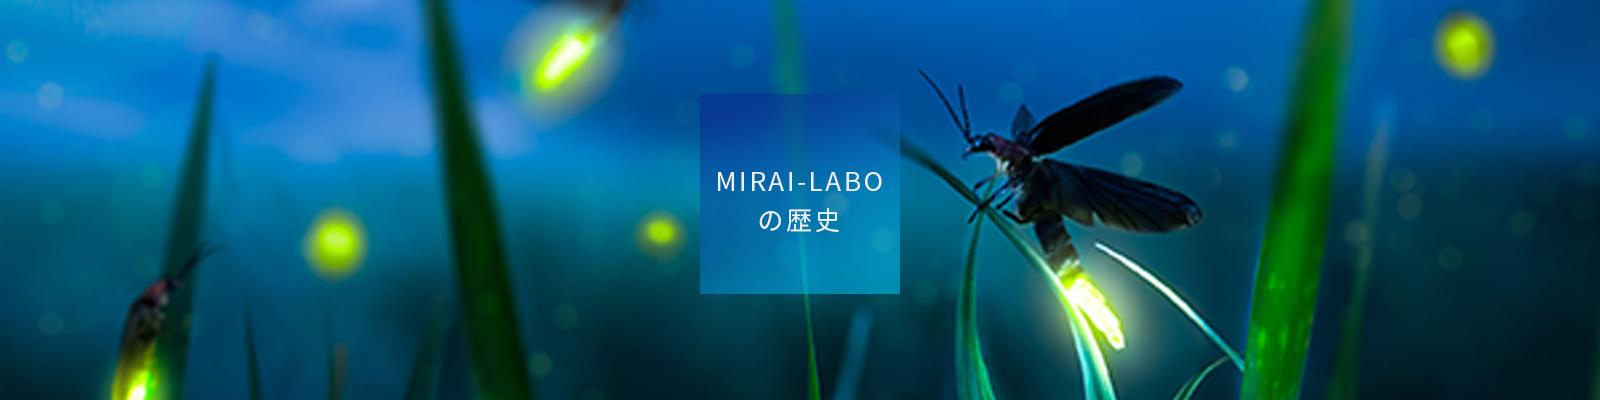 MIRAI-LABOの歴史